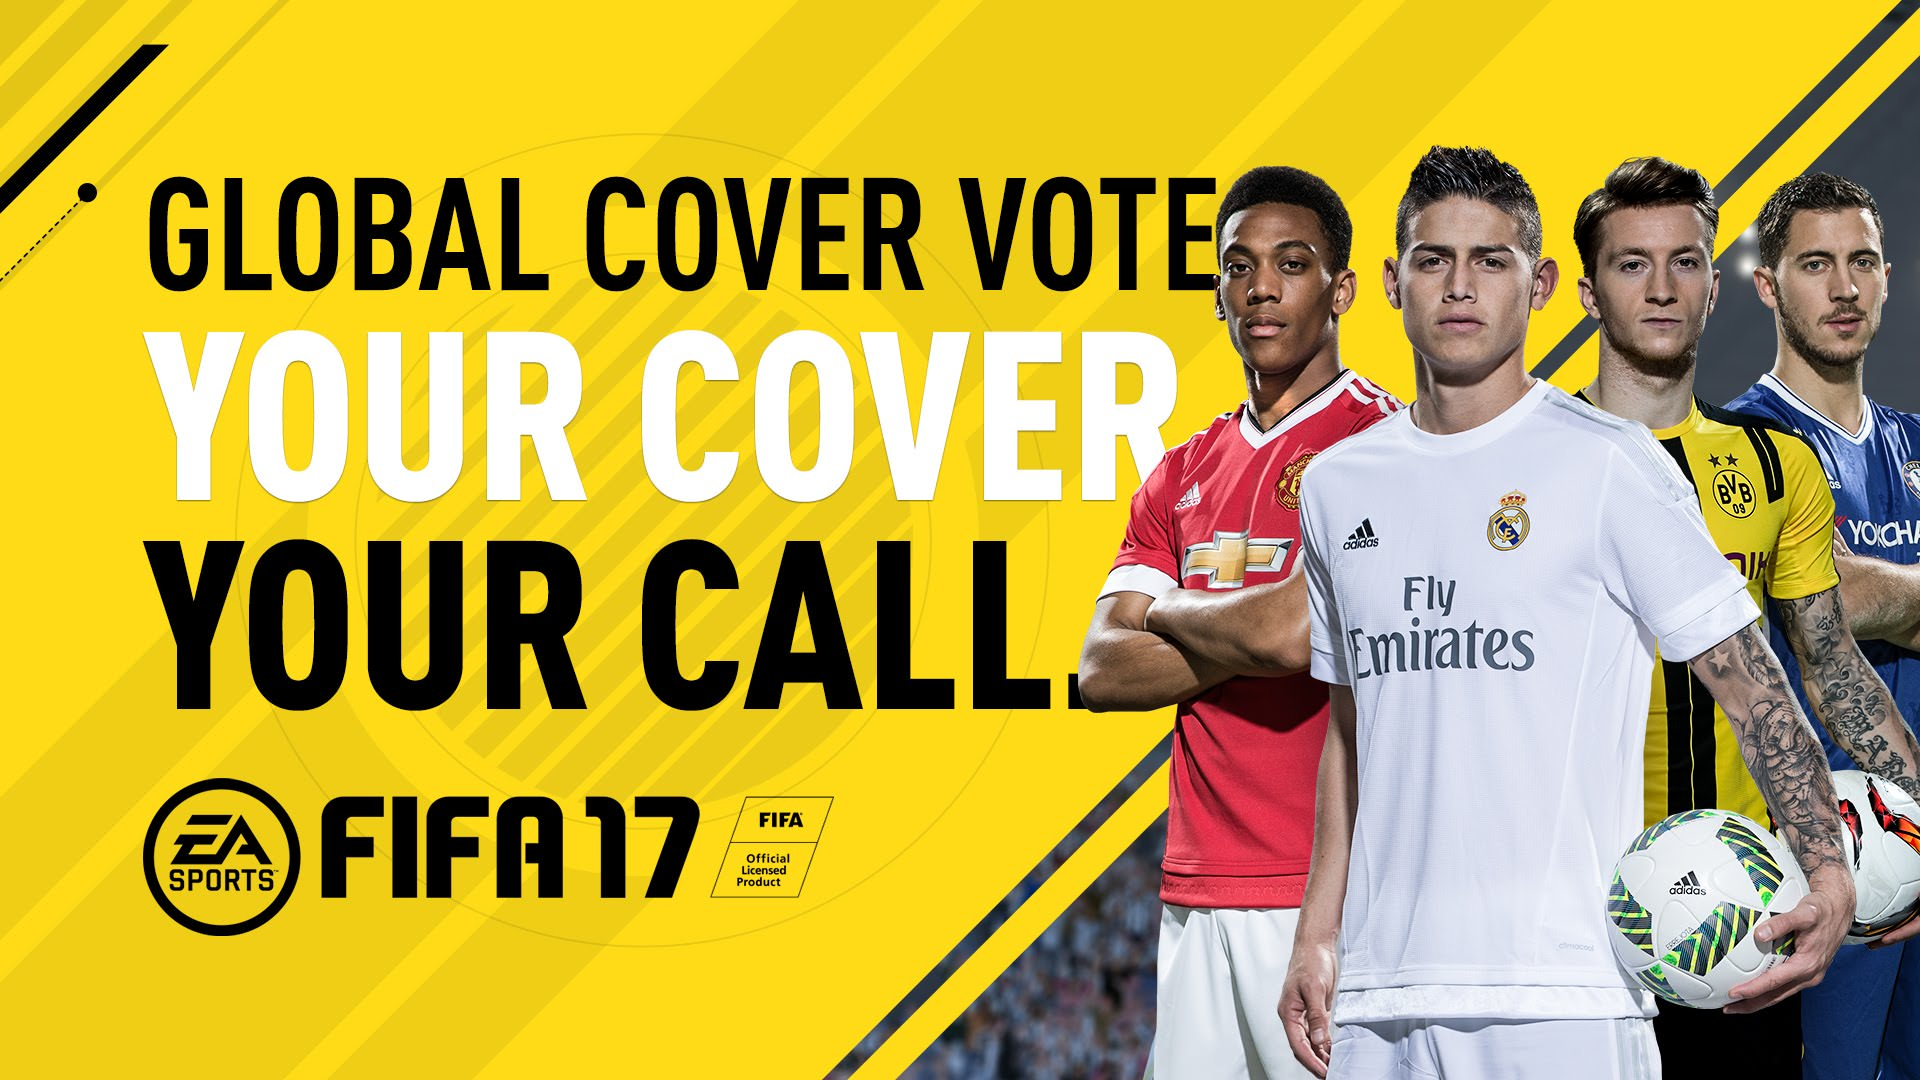 Vote for FIFA 17 Cover